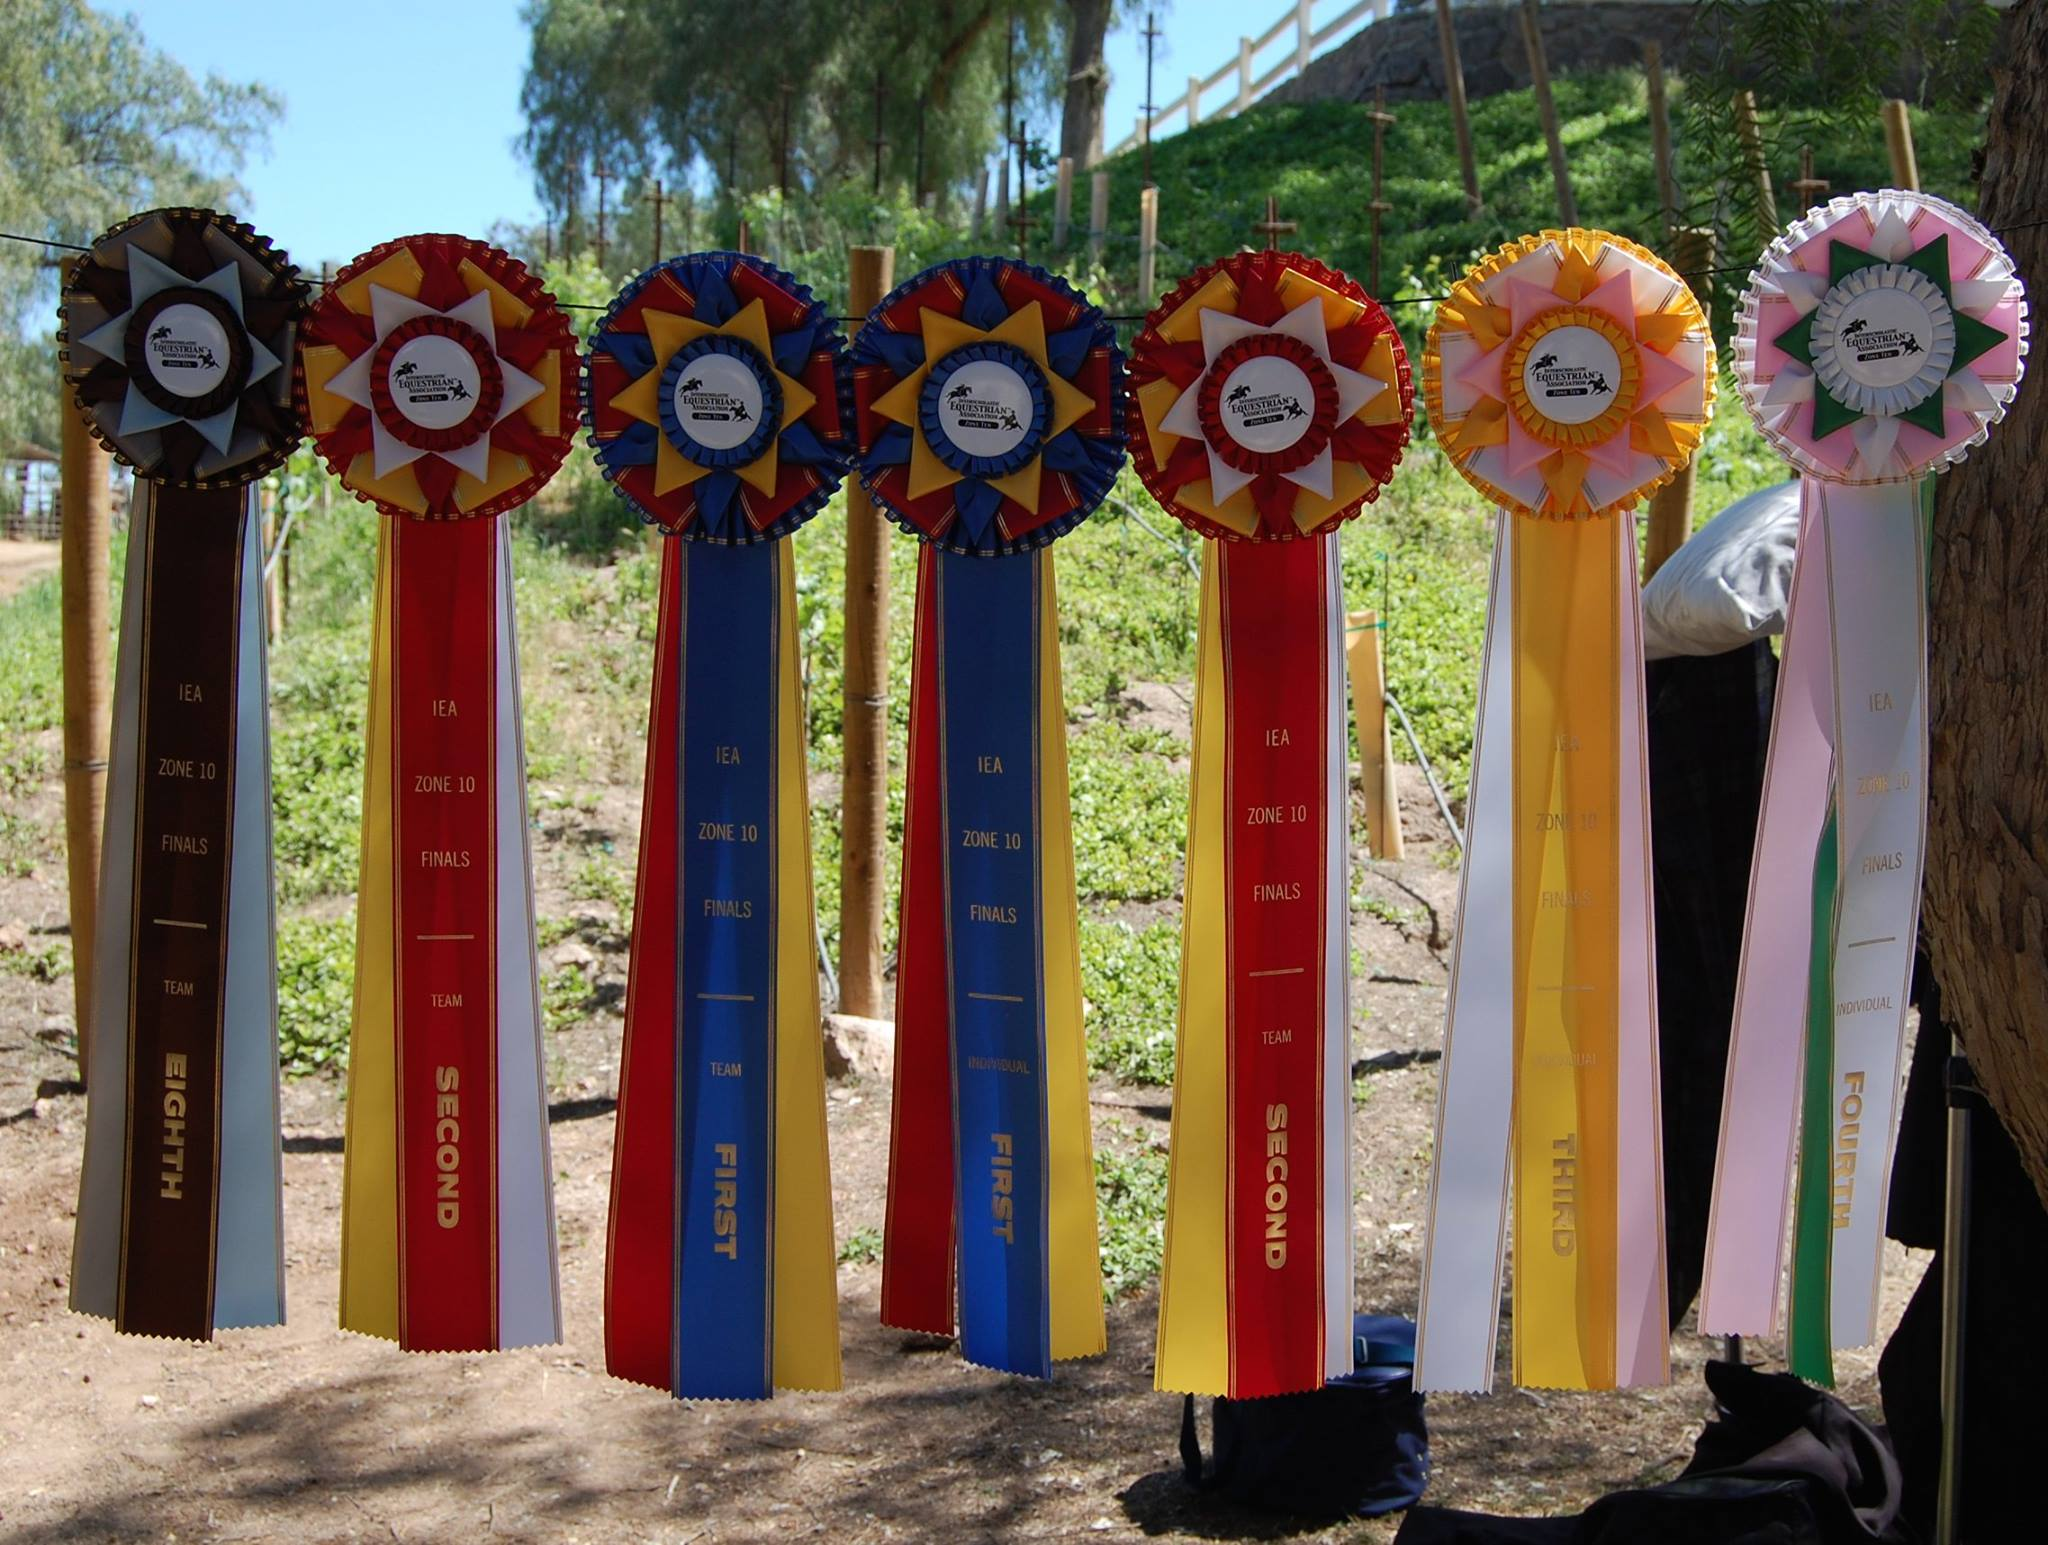 TBS IEA Champion Ribbons